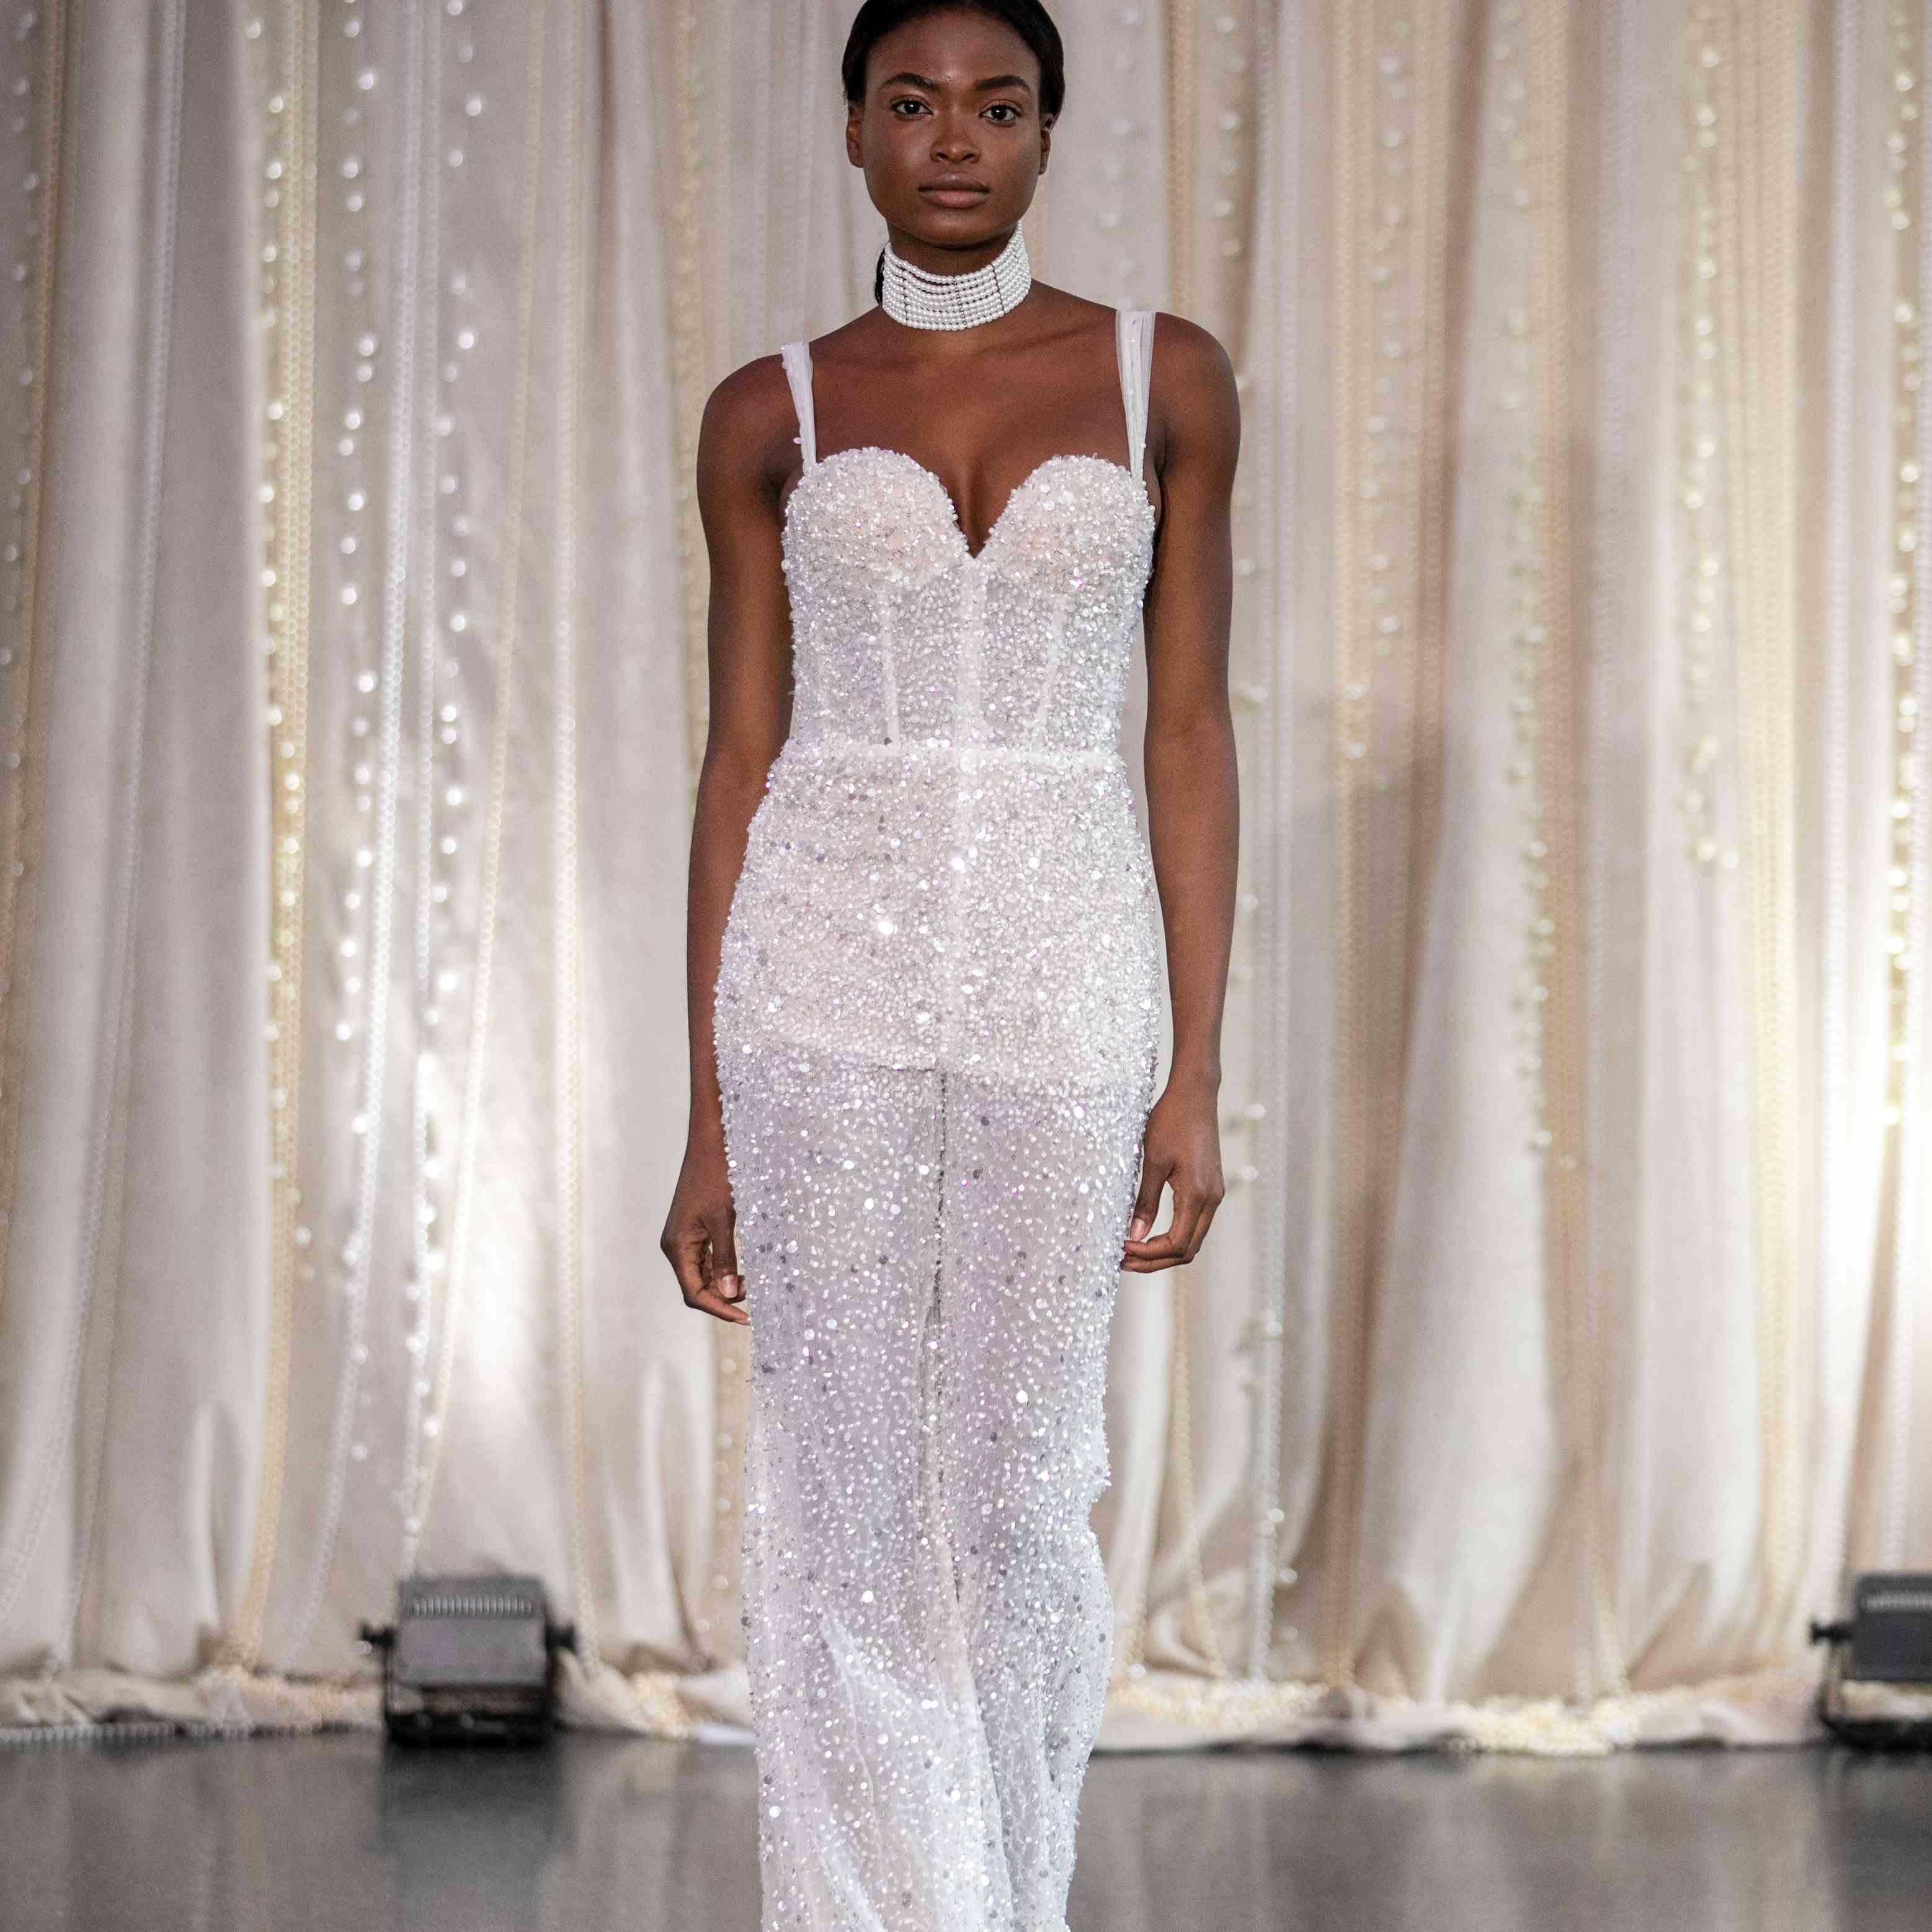 Model in sleeveless beaded wedding jumpsuit